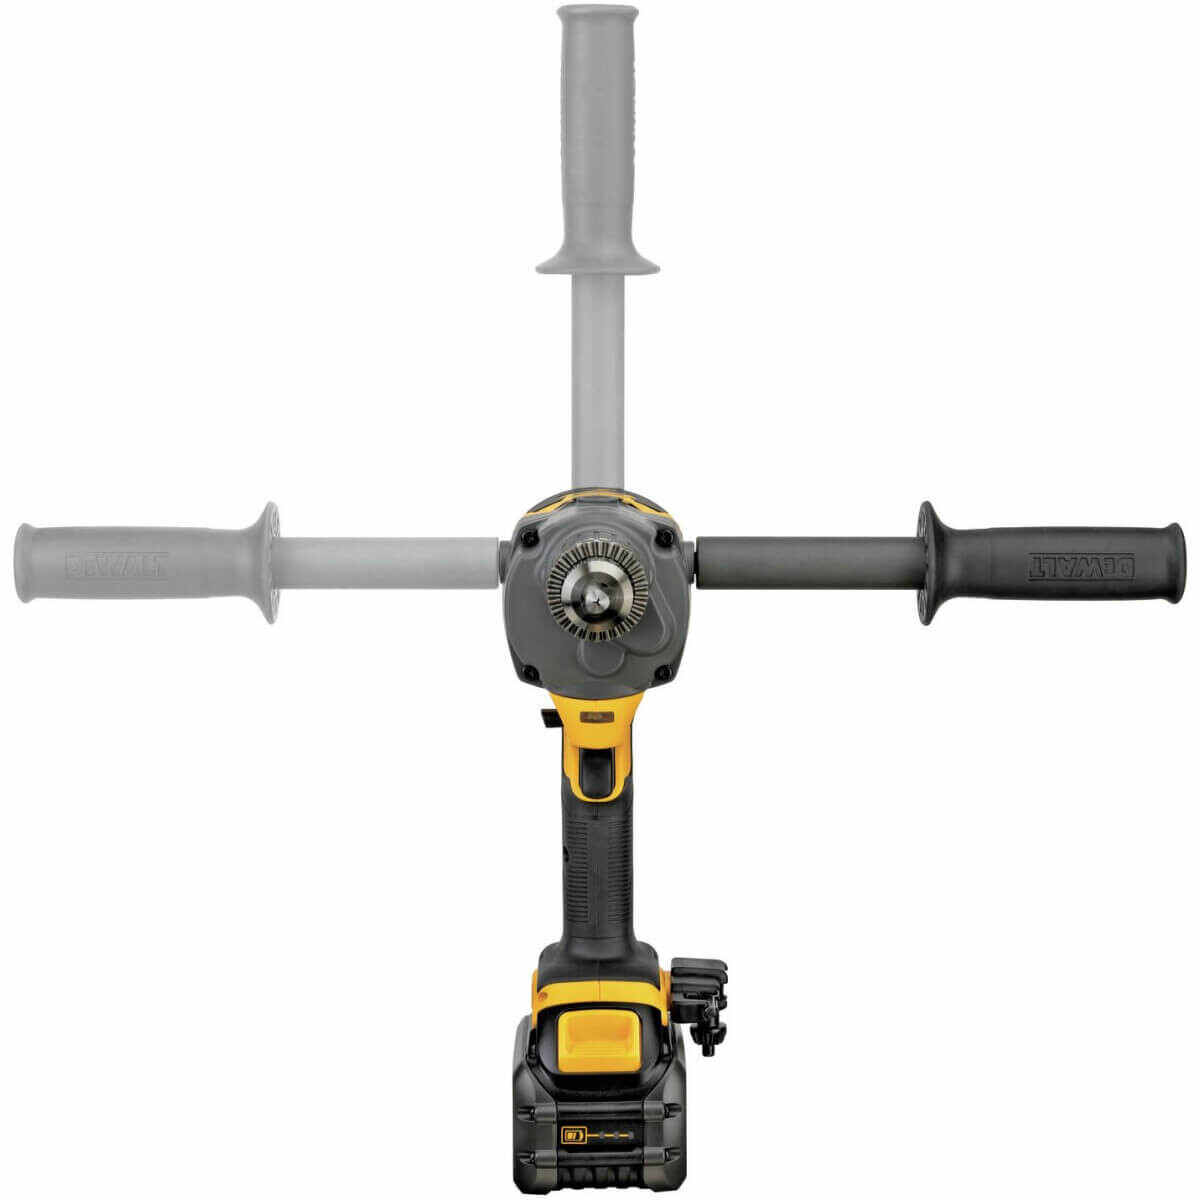 Dewalt DCD130B 3-Position side handle